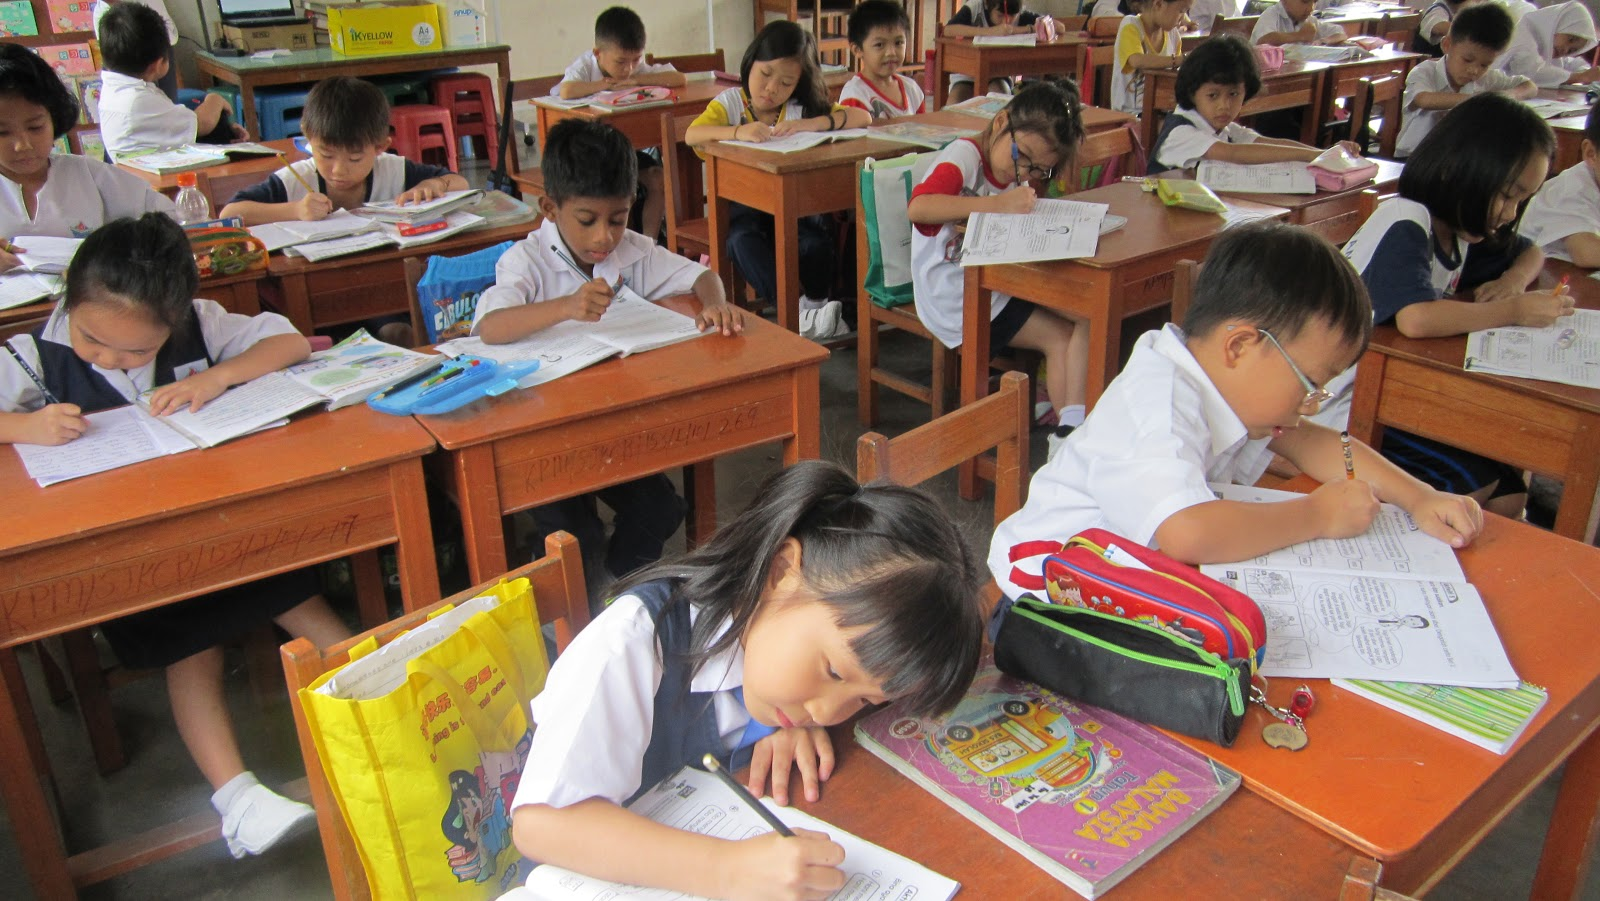 Pelajar sedang sibuk menyiapkan buku latihan.